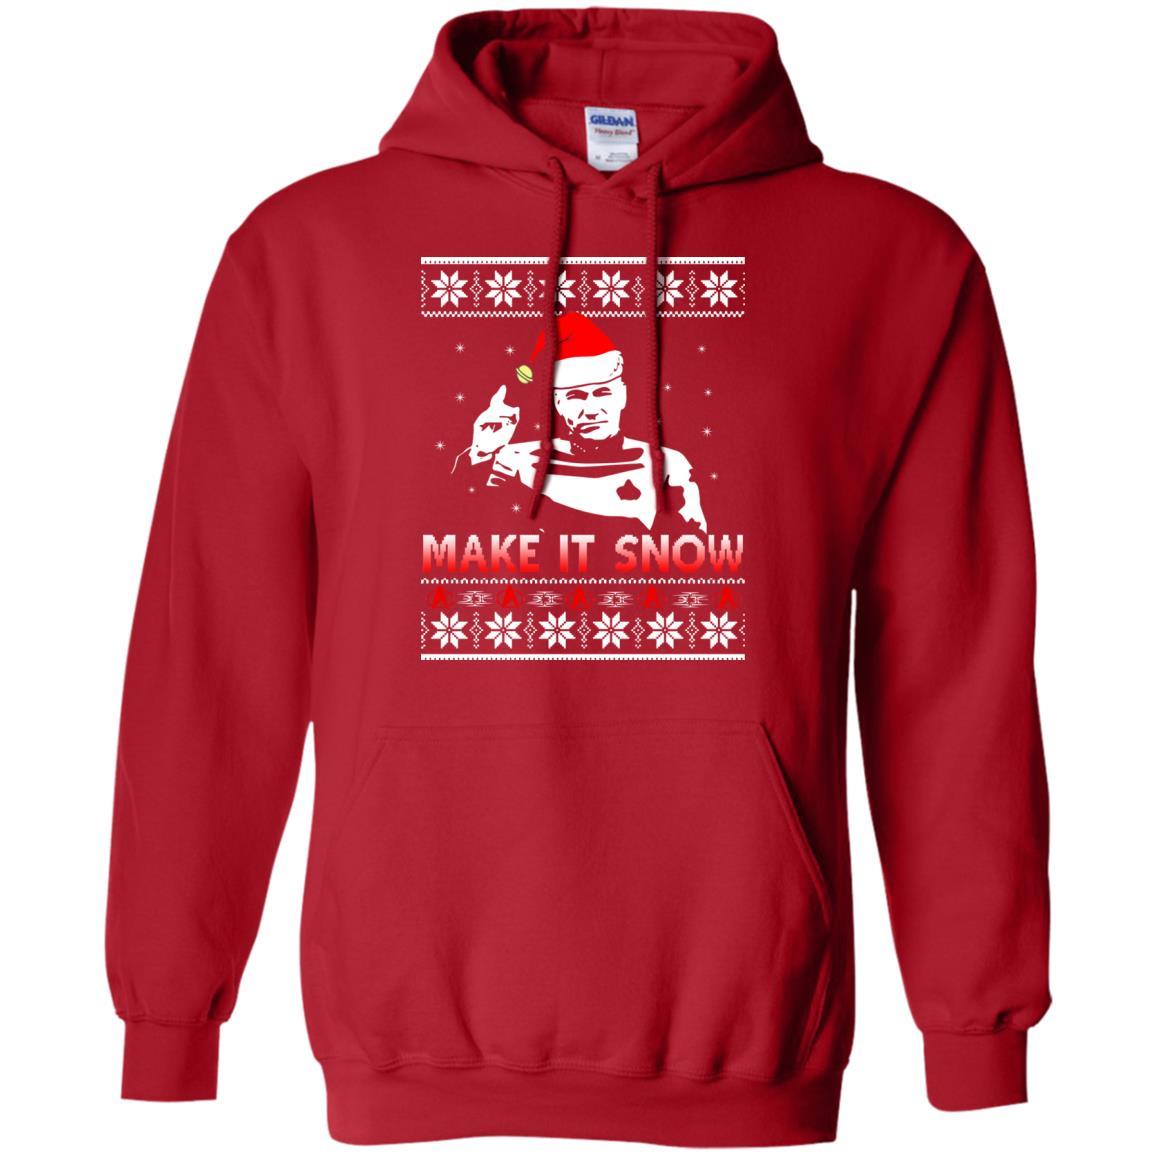 image 2412 - Star Trek make it snow Christmas Sweater, Shirt